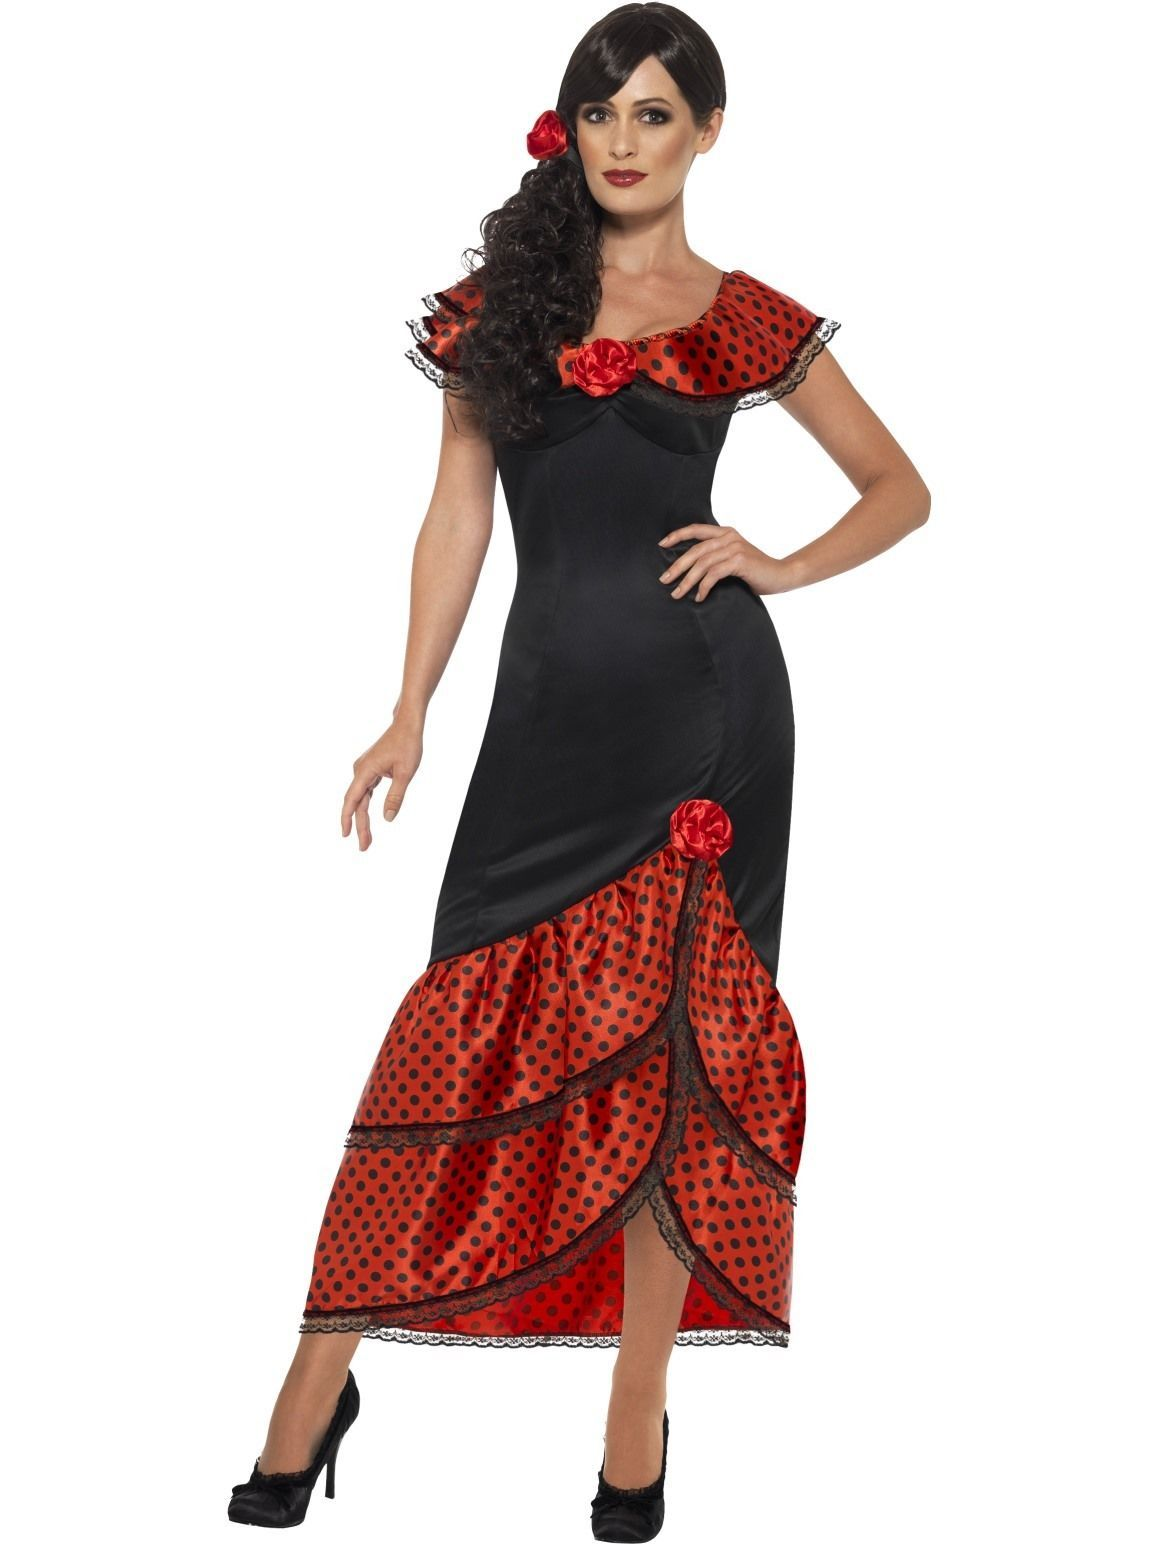 10f869e9384e Flamenco Senorita Costume Spanish Mexican Saloon Dancer Fancy Dress Outfit  | eBay